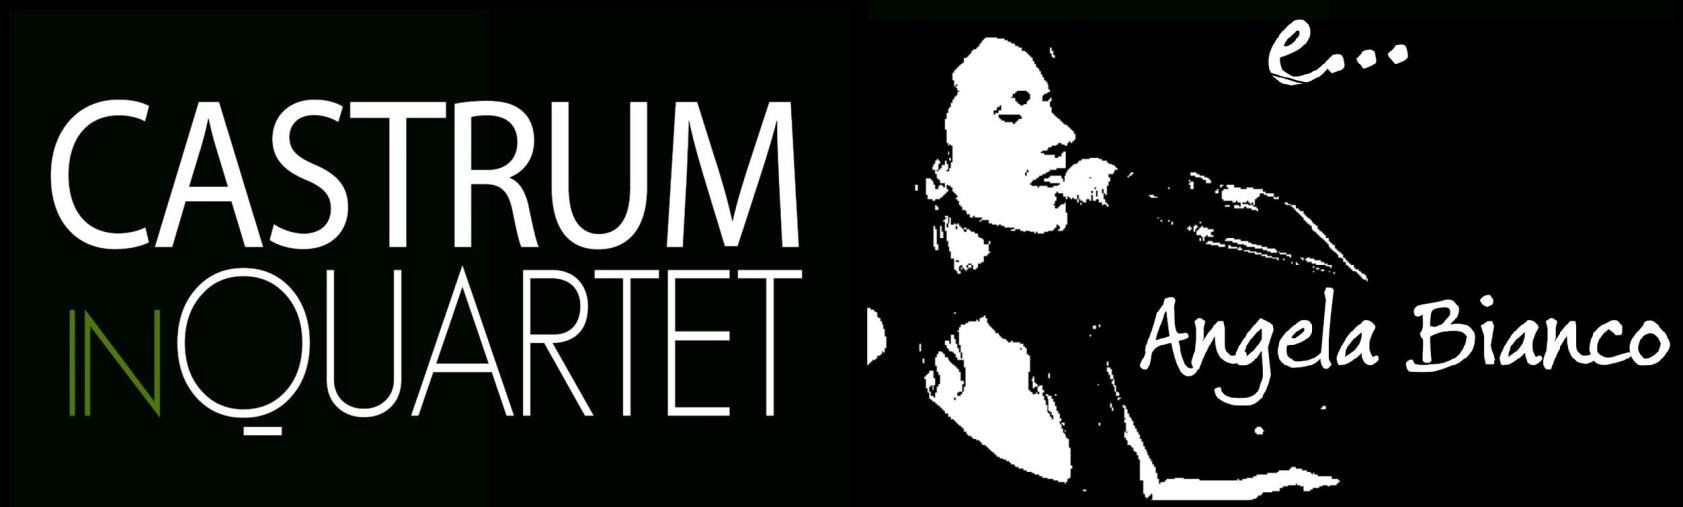 images Angela Bianco ed i Castrum in Quartet alla Notte Bianca di Soveria Mannelli